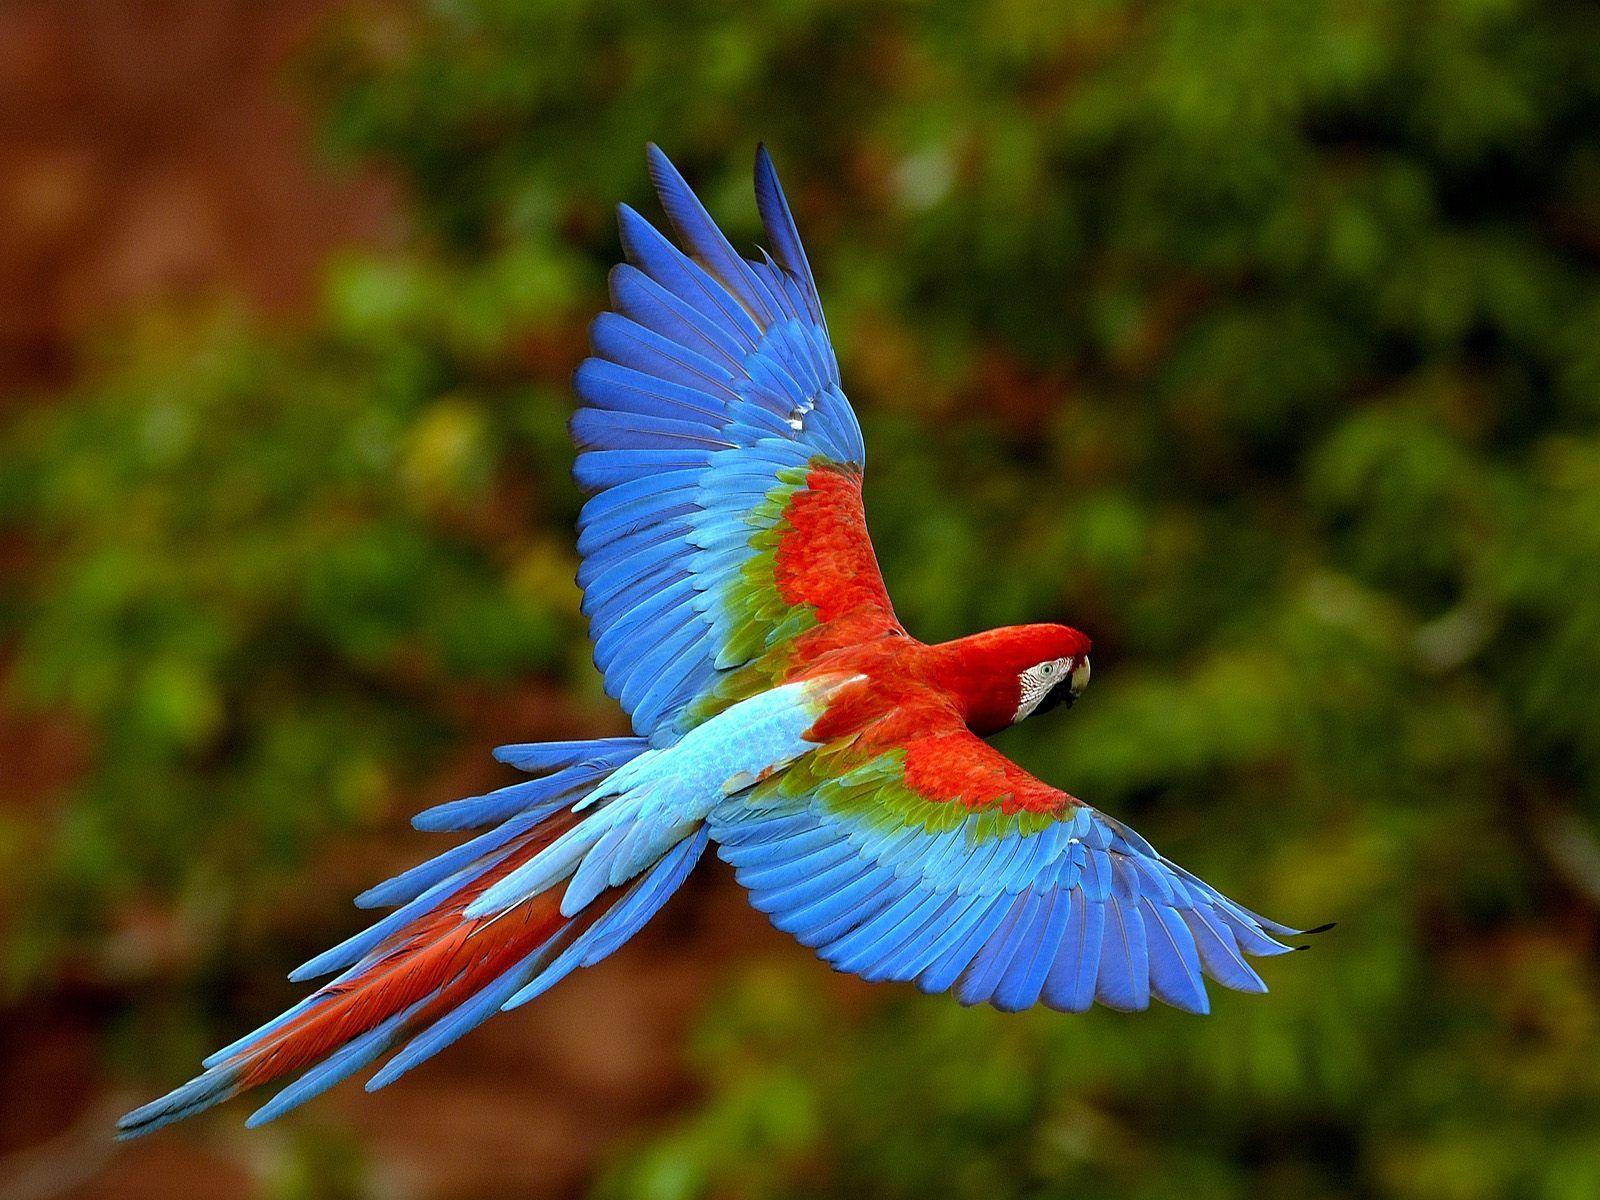 A Beautiful Couple Of Lorikeet Birds Wallpaper Hd: Rainbow Lorikeet Parrot New Wallpapers